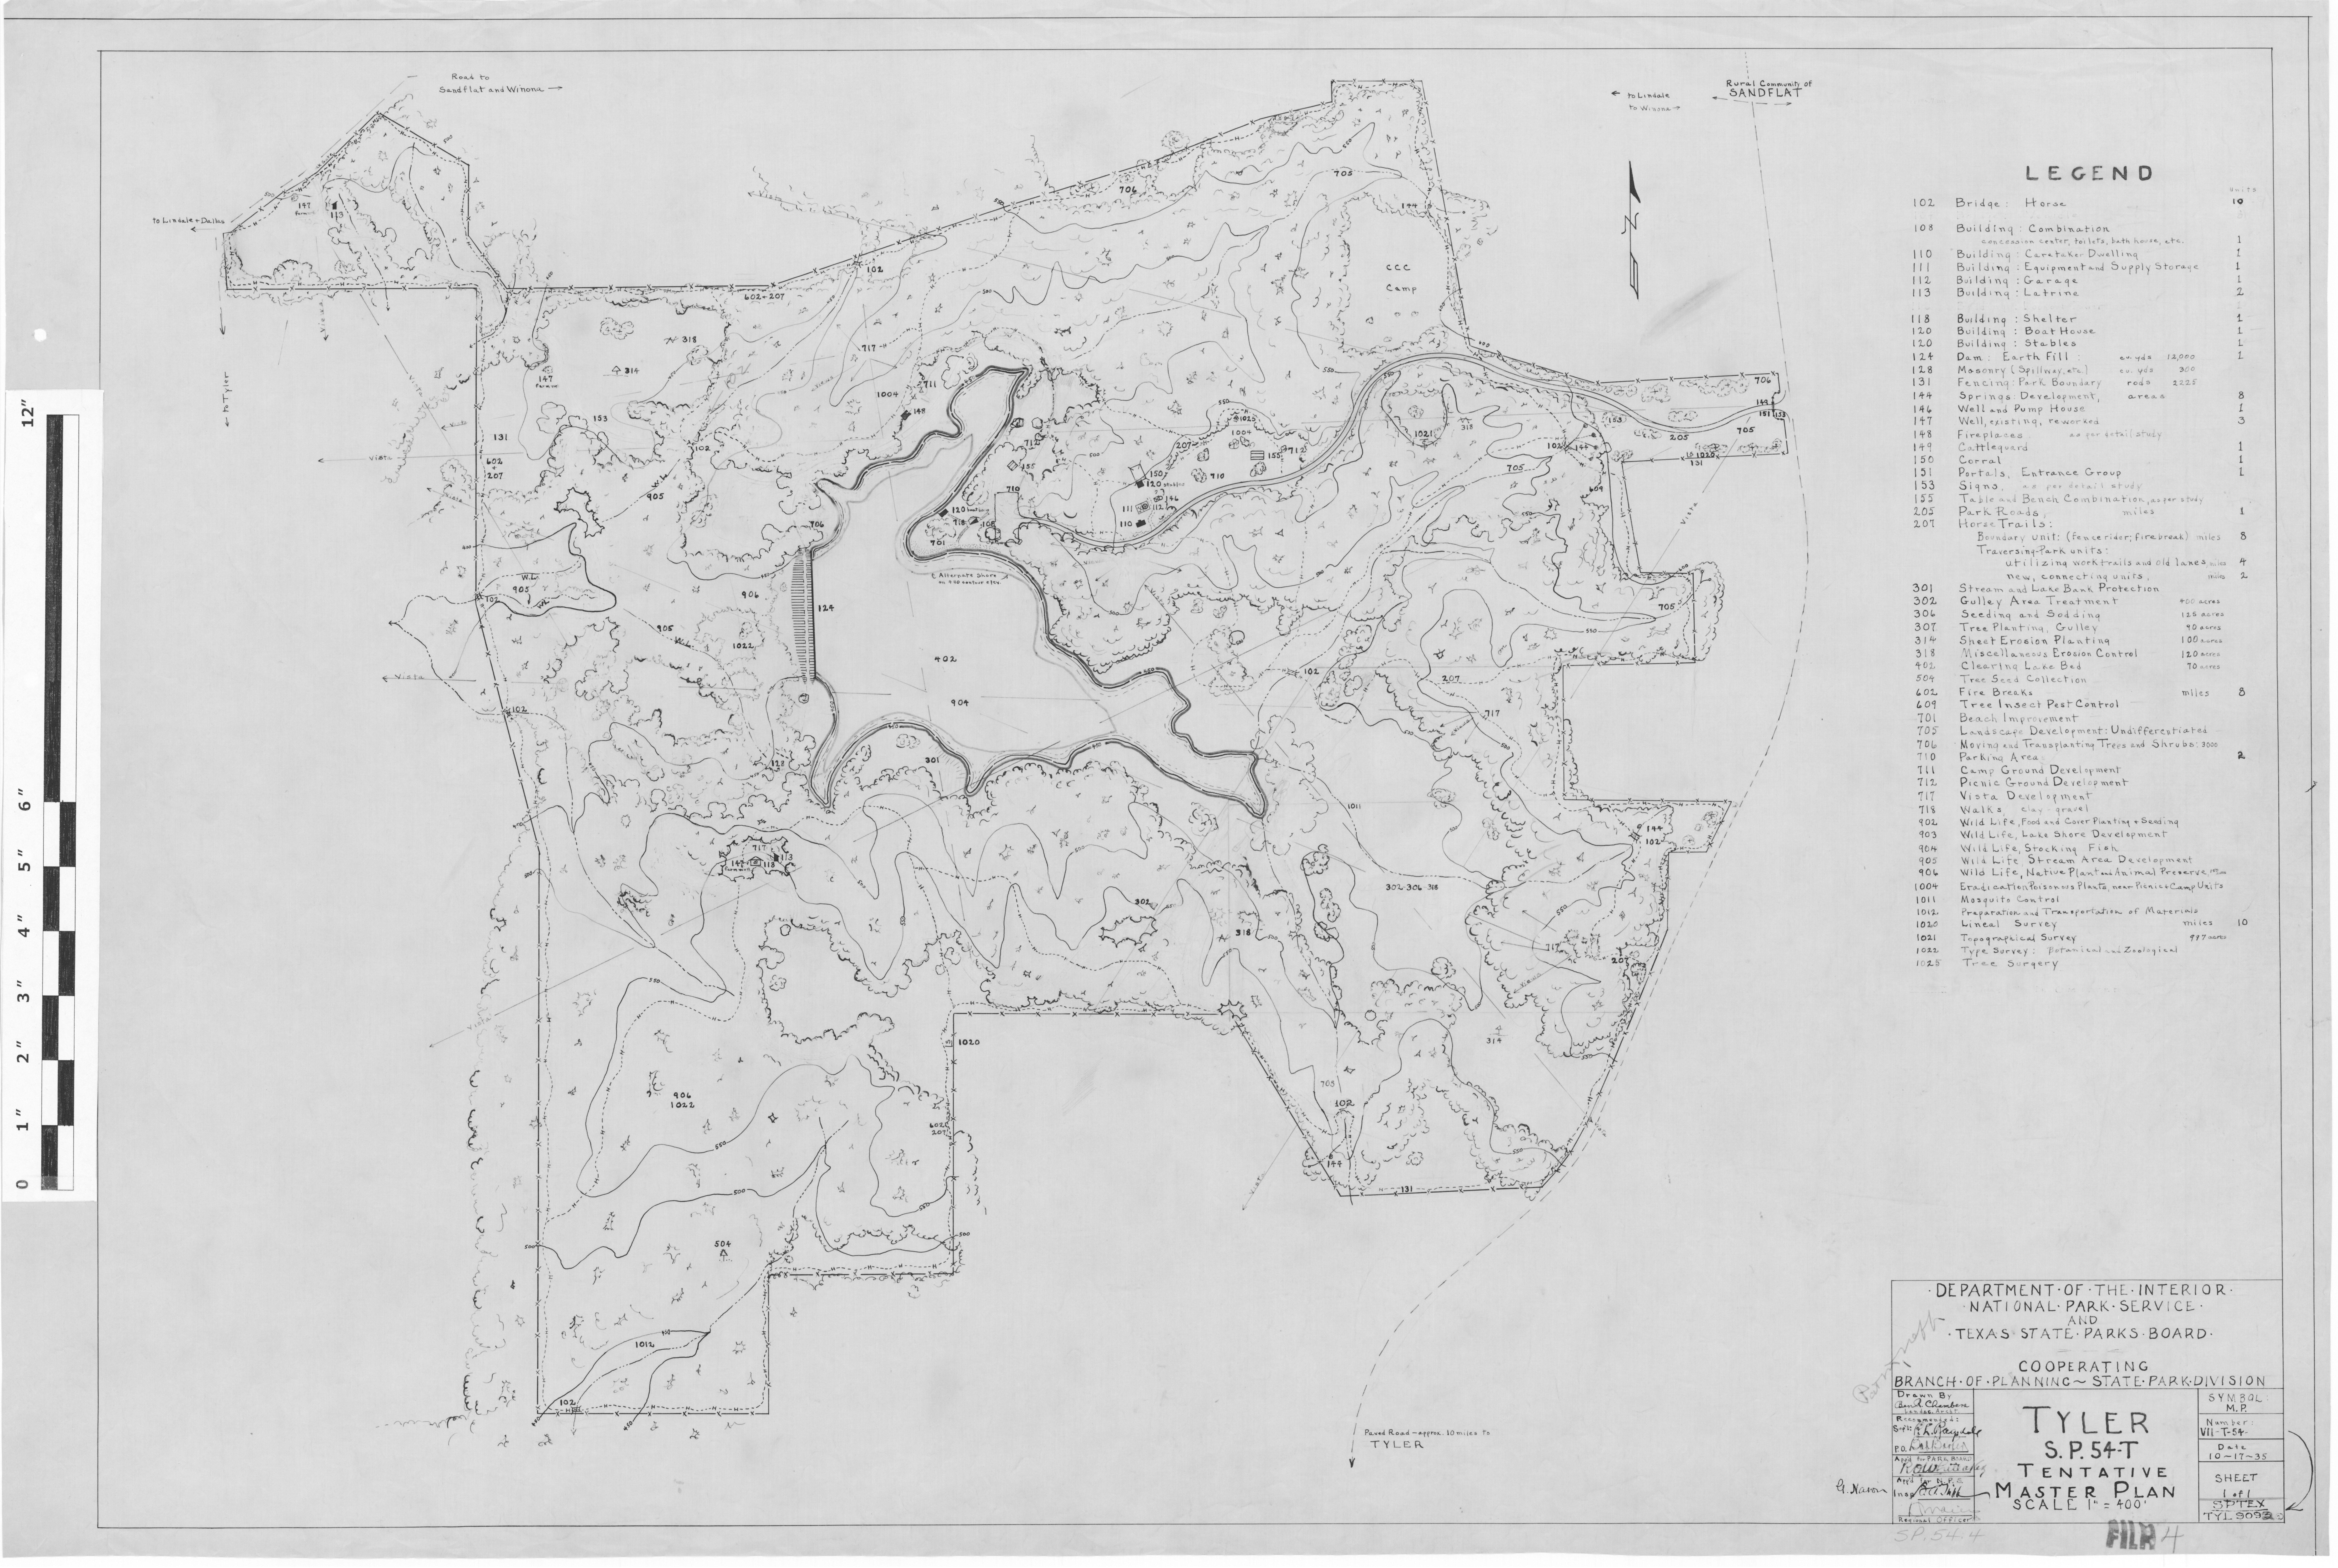 Tyler State Park - Tentative Master Plan - SP.54.4